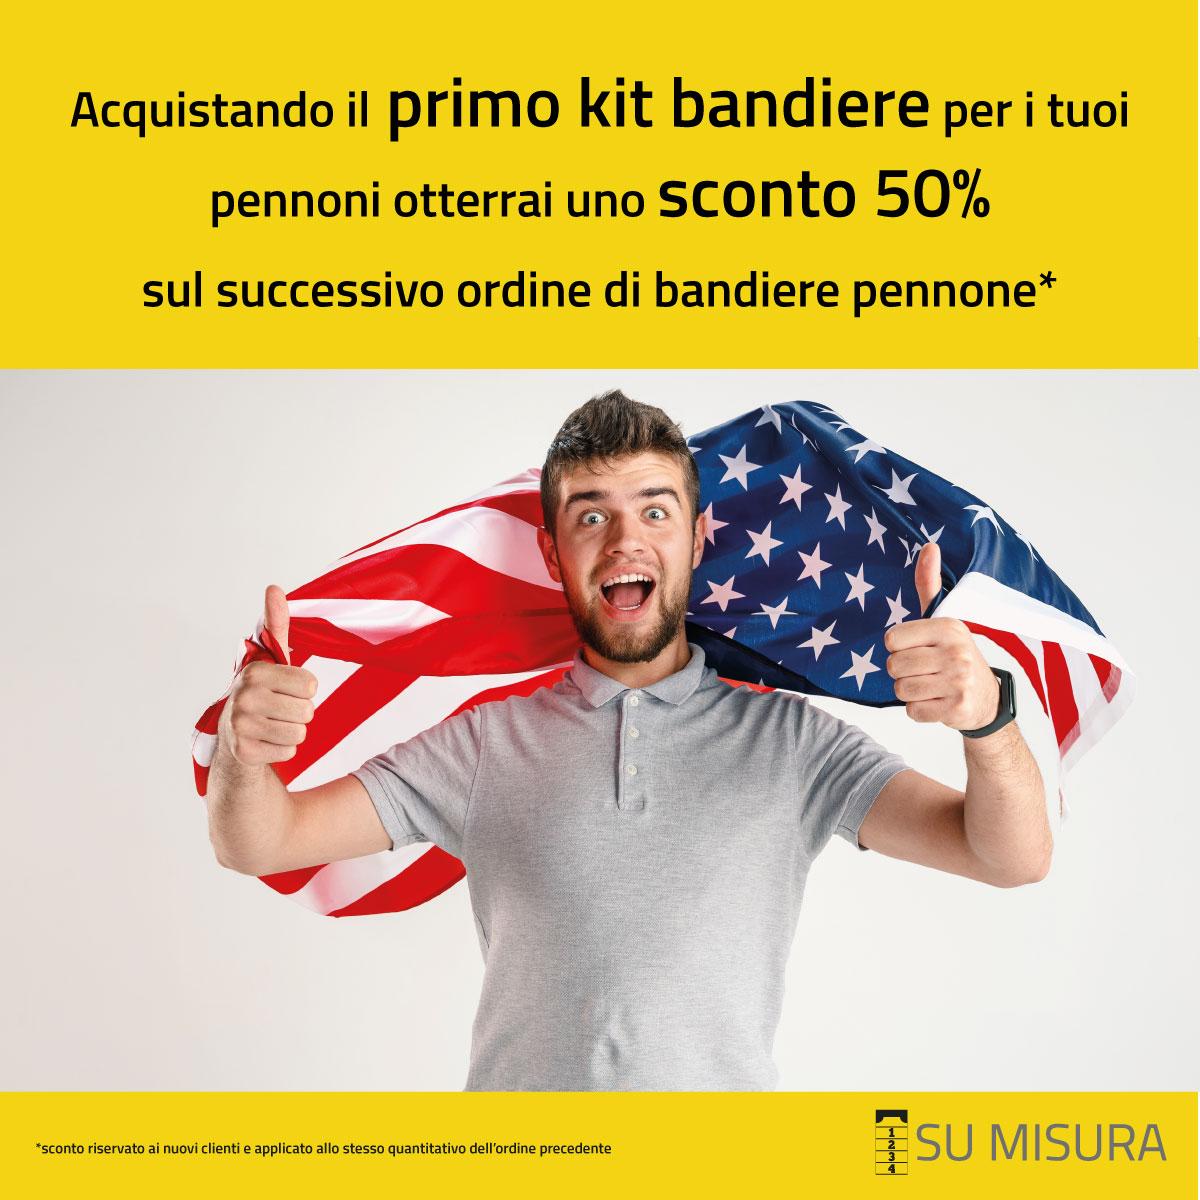 https://su-misura.biz/wp-content/uploads/2021/07/promo-pennone-sconto-50.jpg